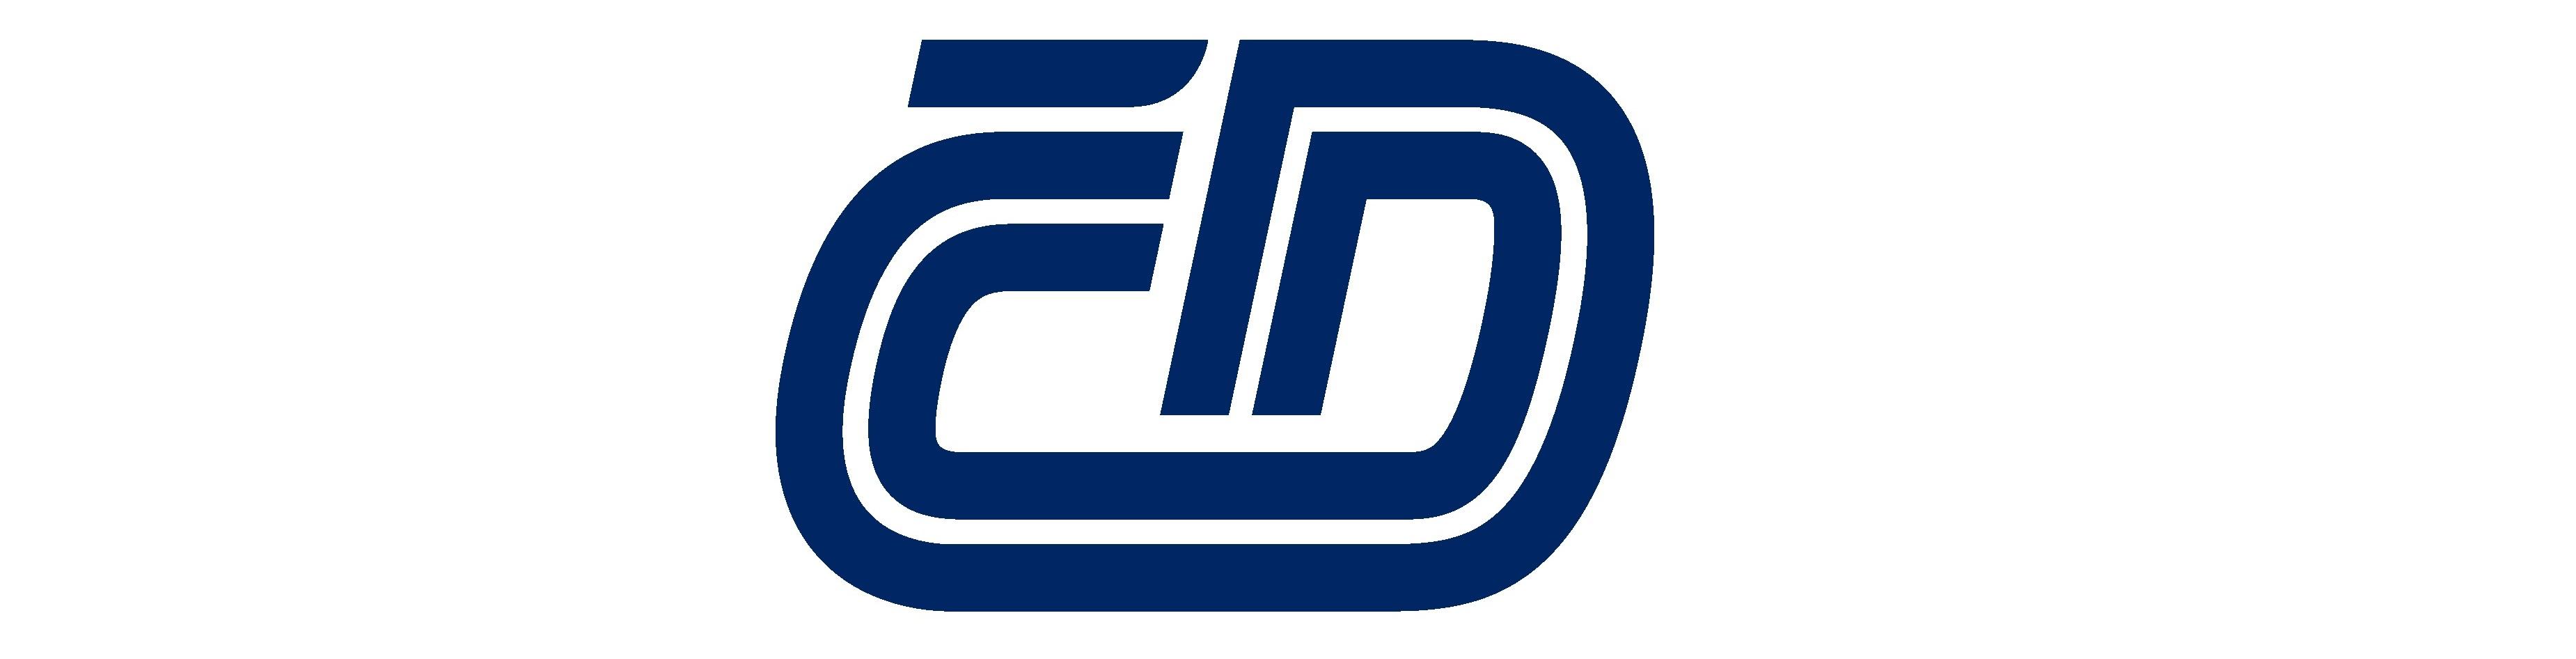 Logo ČD u